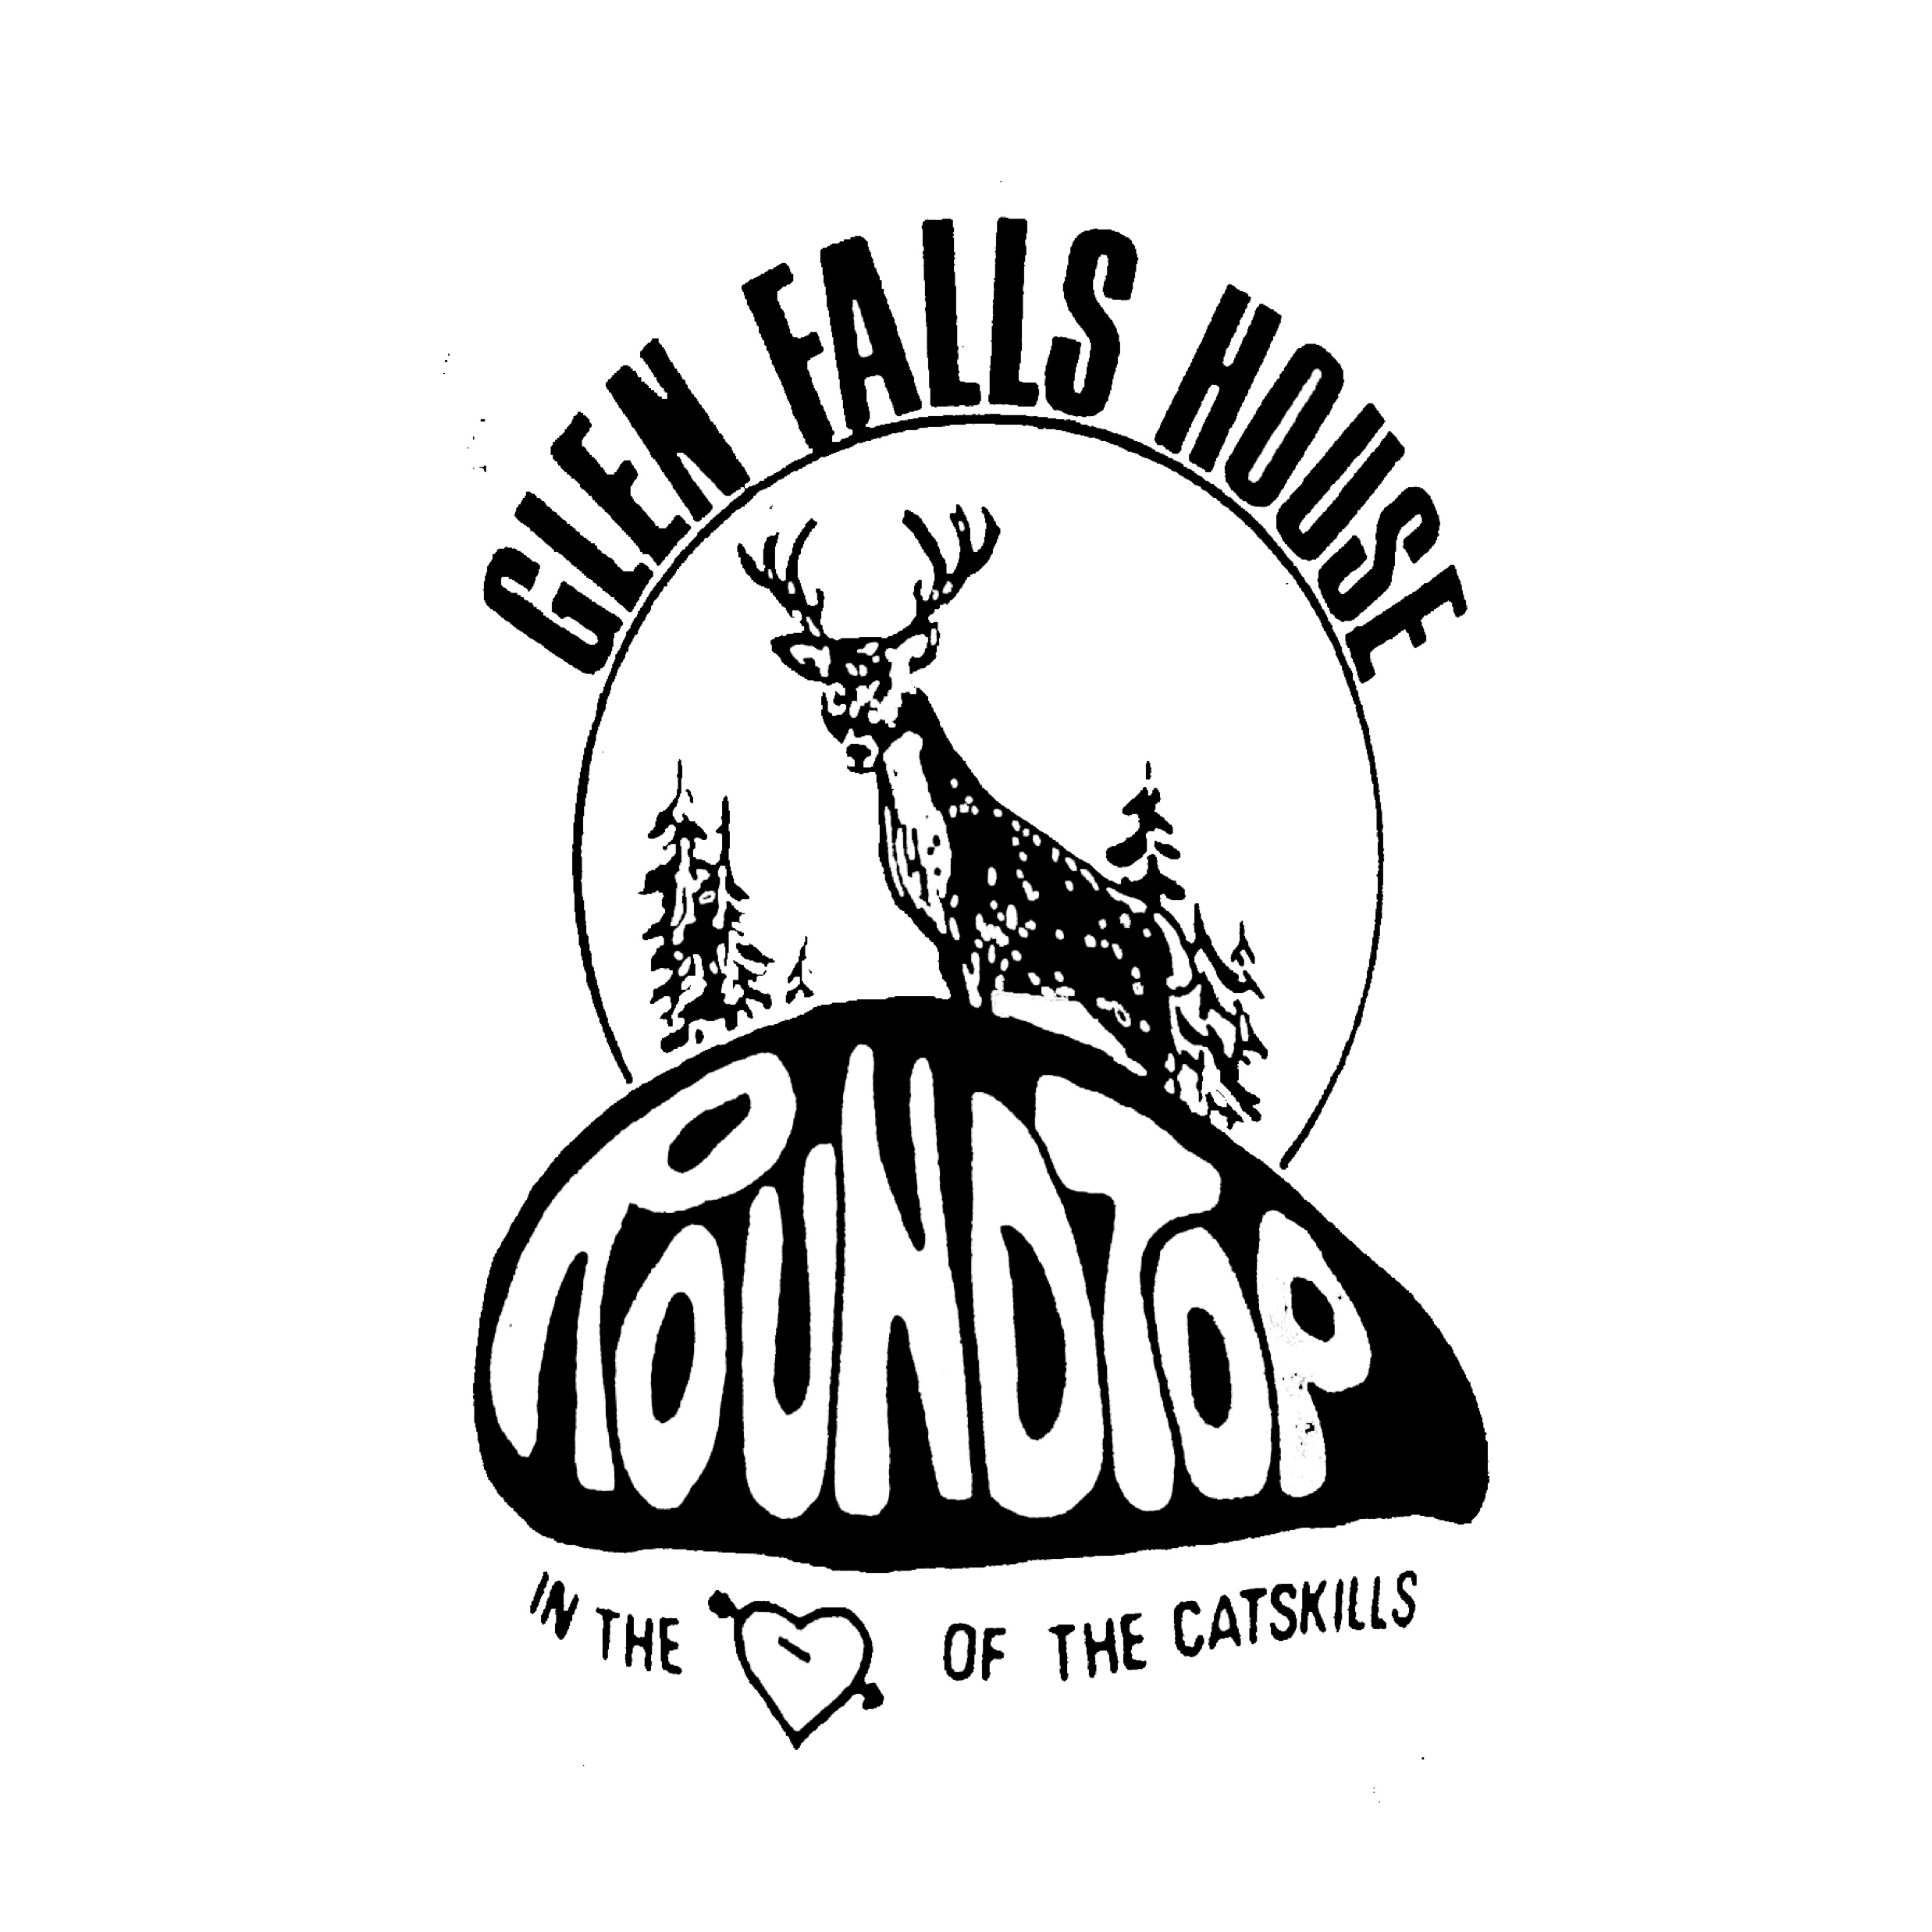 Glen Falls House   A Timeless Catskills Hotel.